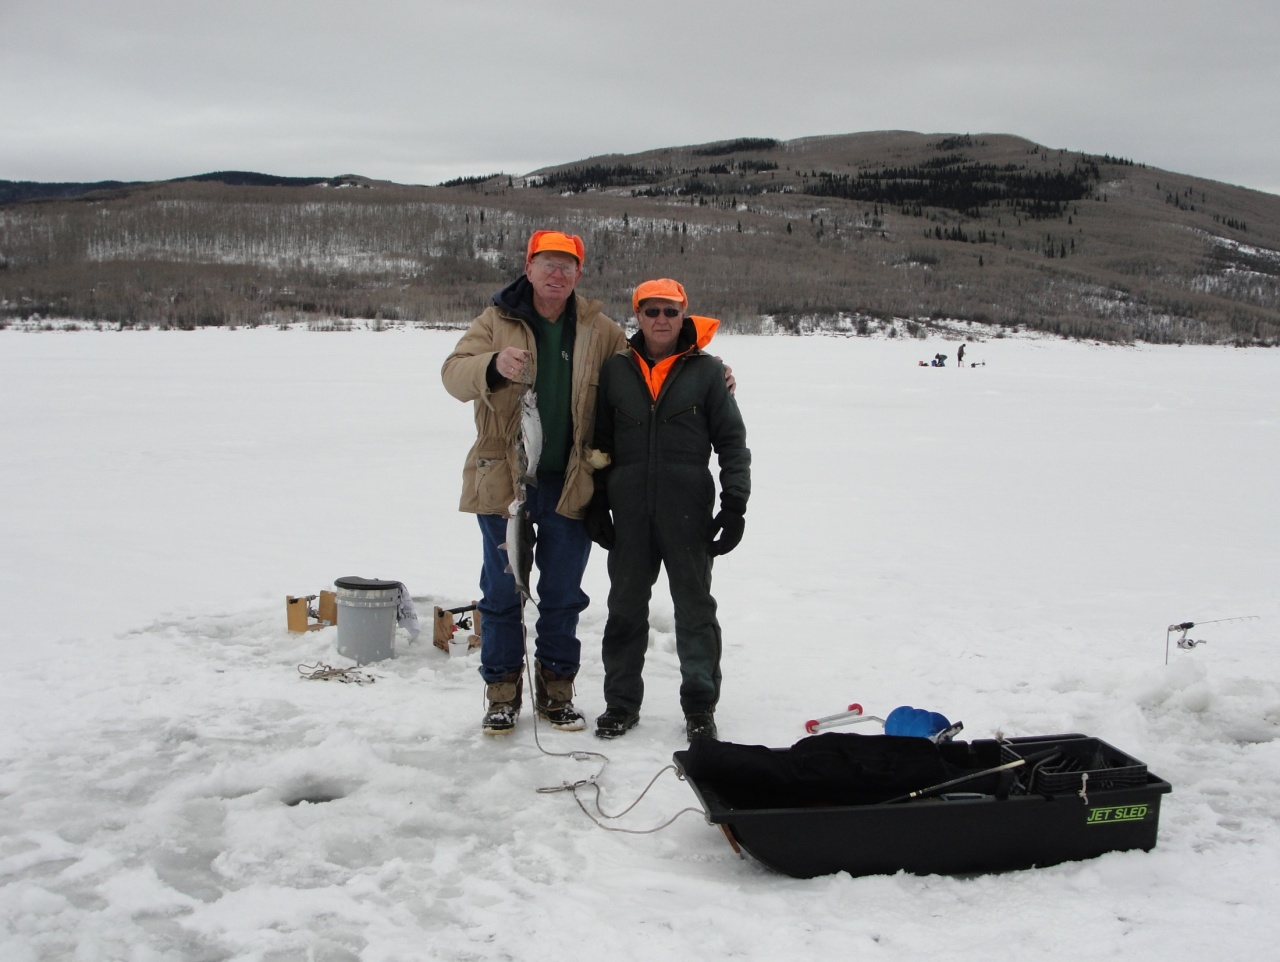 Colorado 39 s vega state park hosts ice fishing tournament for Ice fishing tournament